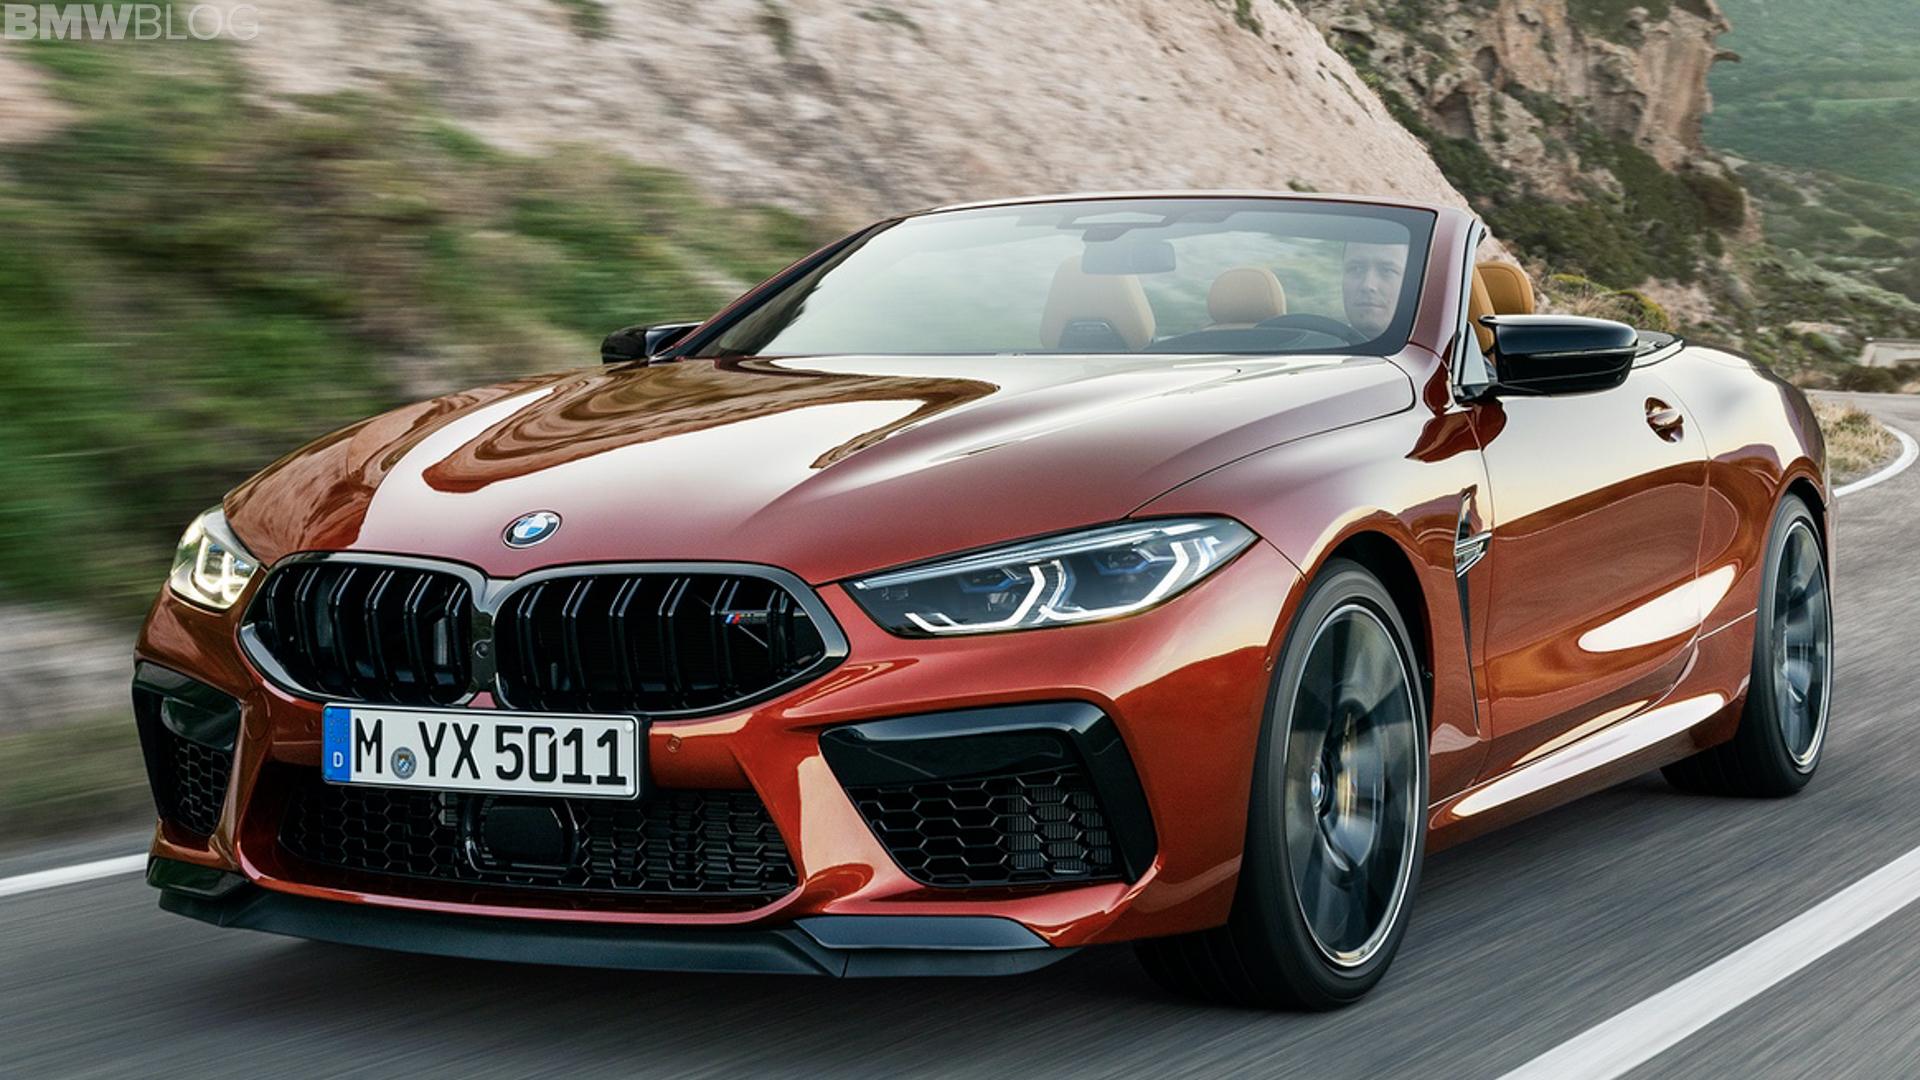 BMW M8 Convertible vs BMW M6 Convertible 7 of 16